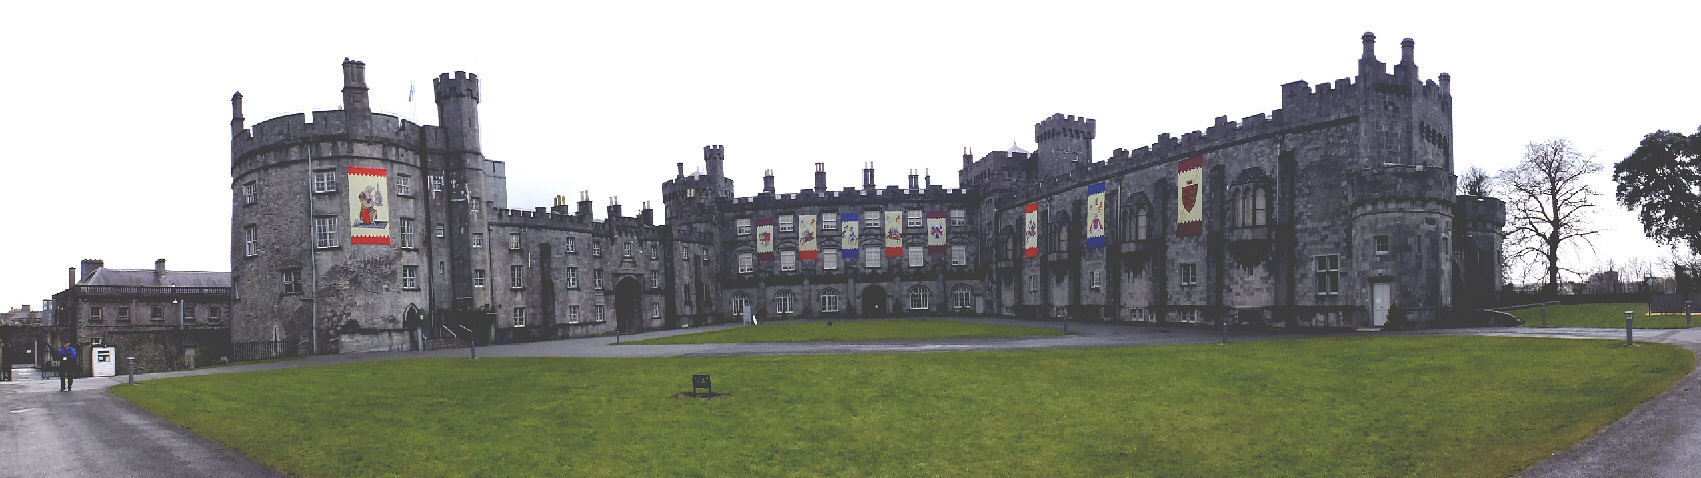 Irish Impressions 04